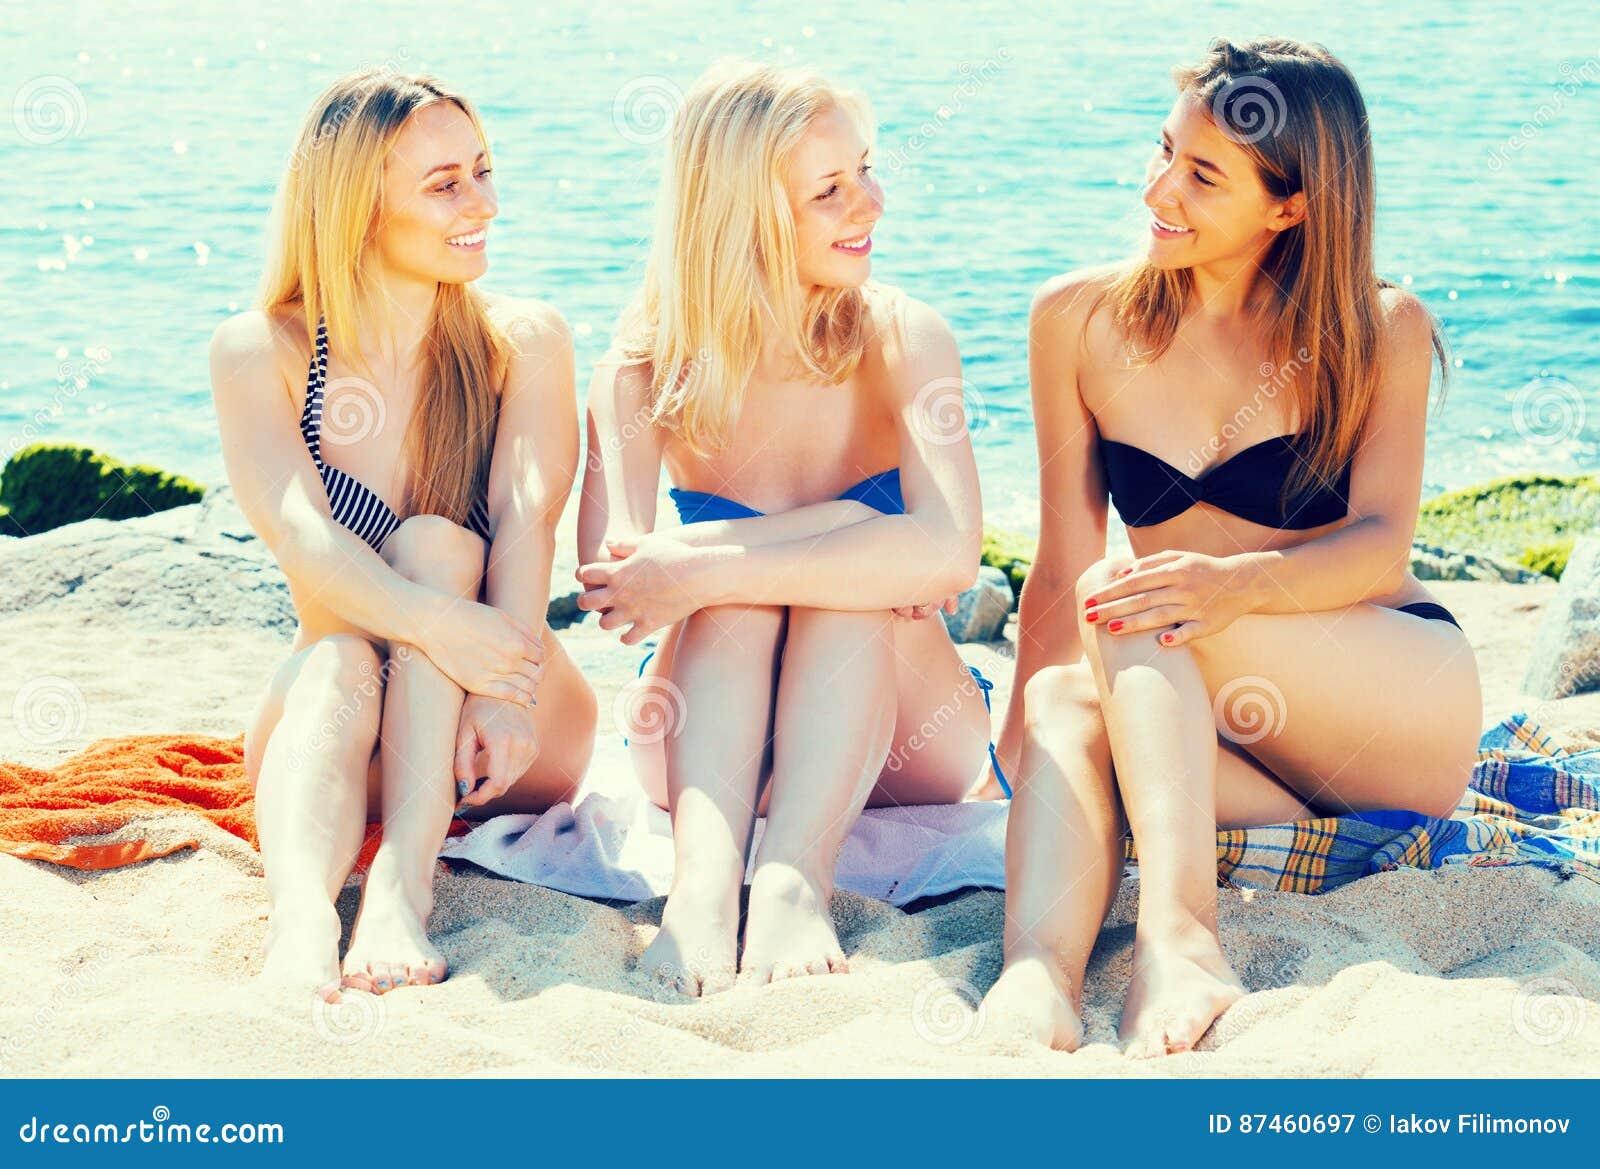 f9407435a0294 Three joyful smiling girls in bikini relaxing on sandy beach on sunny day